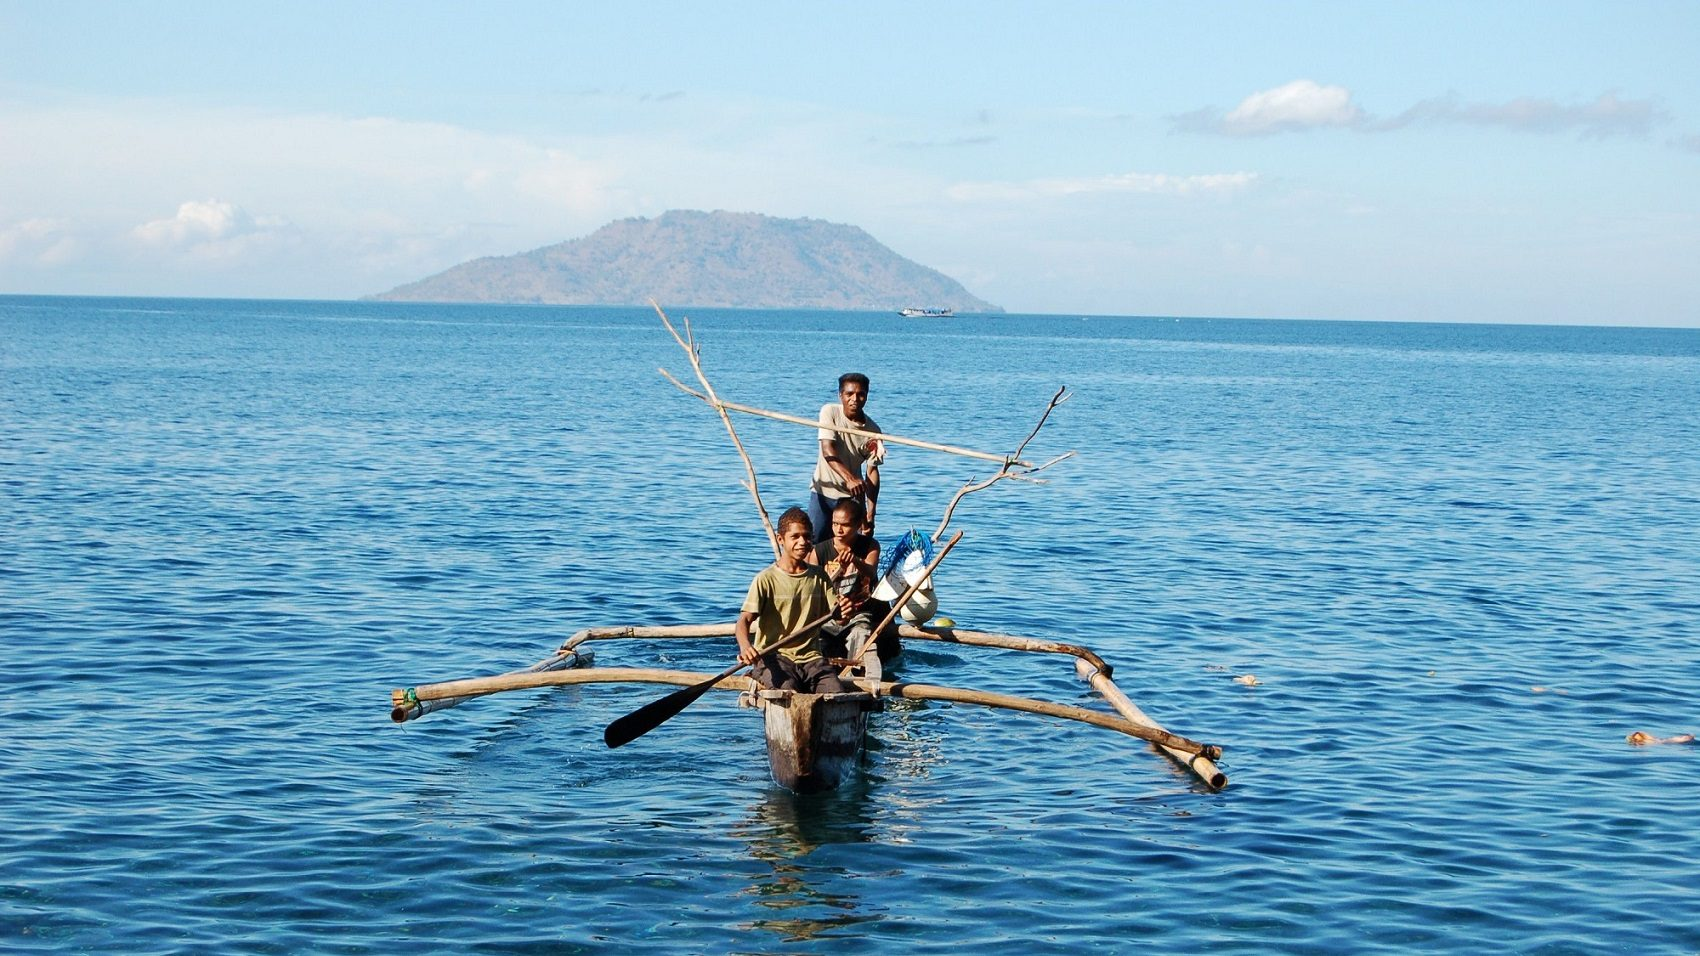 Omgeving van de Alor-Pantar eilanden. (Foto: Marian Klamer)